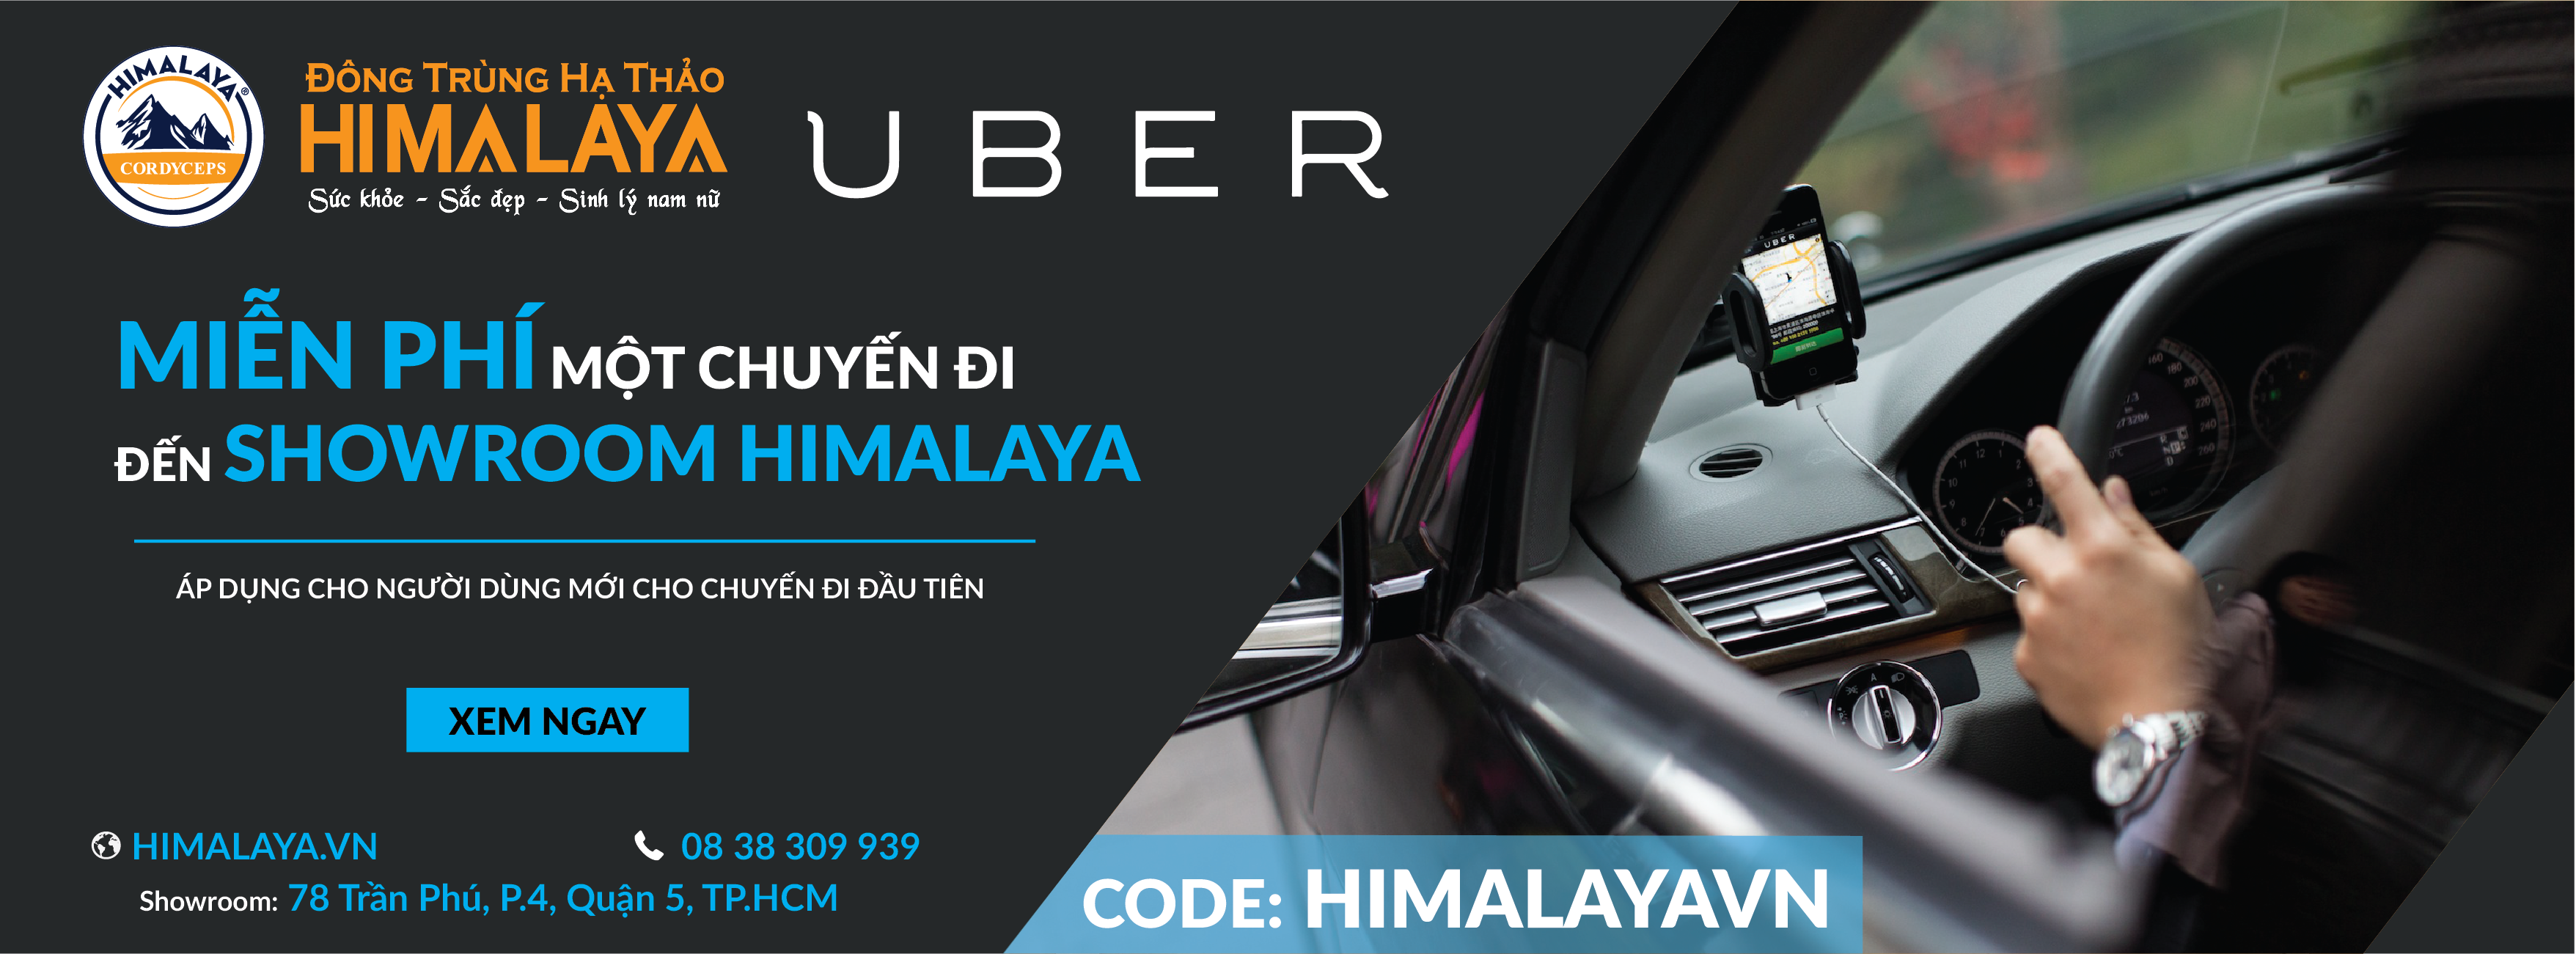 banner-uber-himalaya